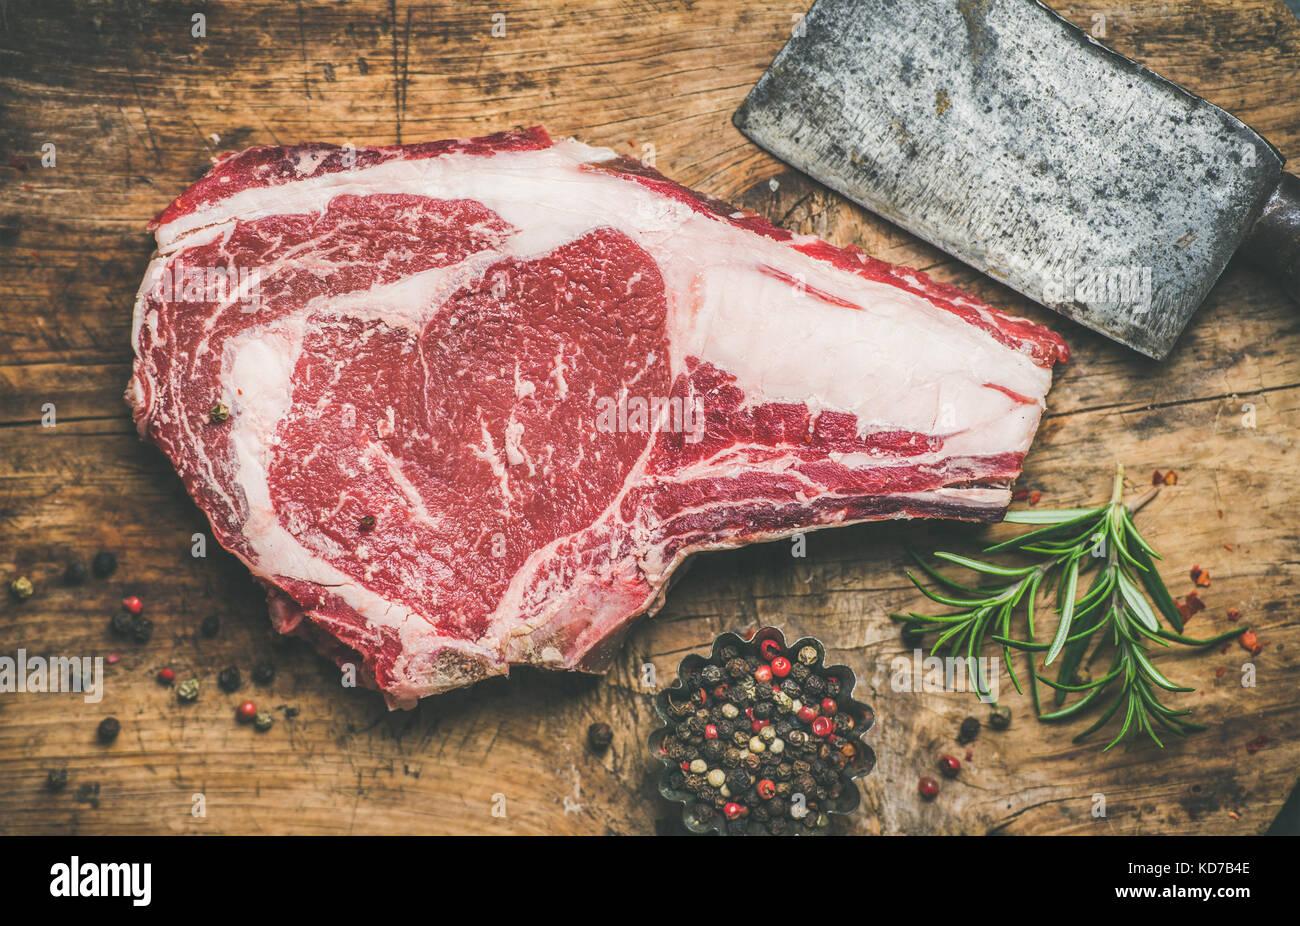 Raw beef steak rib-eye with seasoning and knife, rustic background - Stock Image